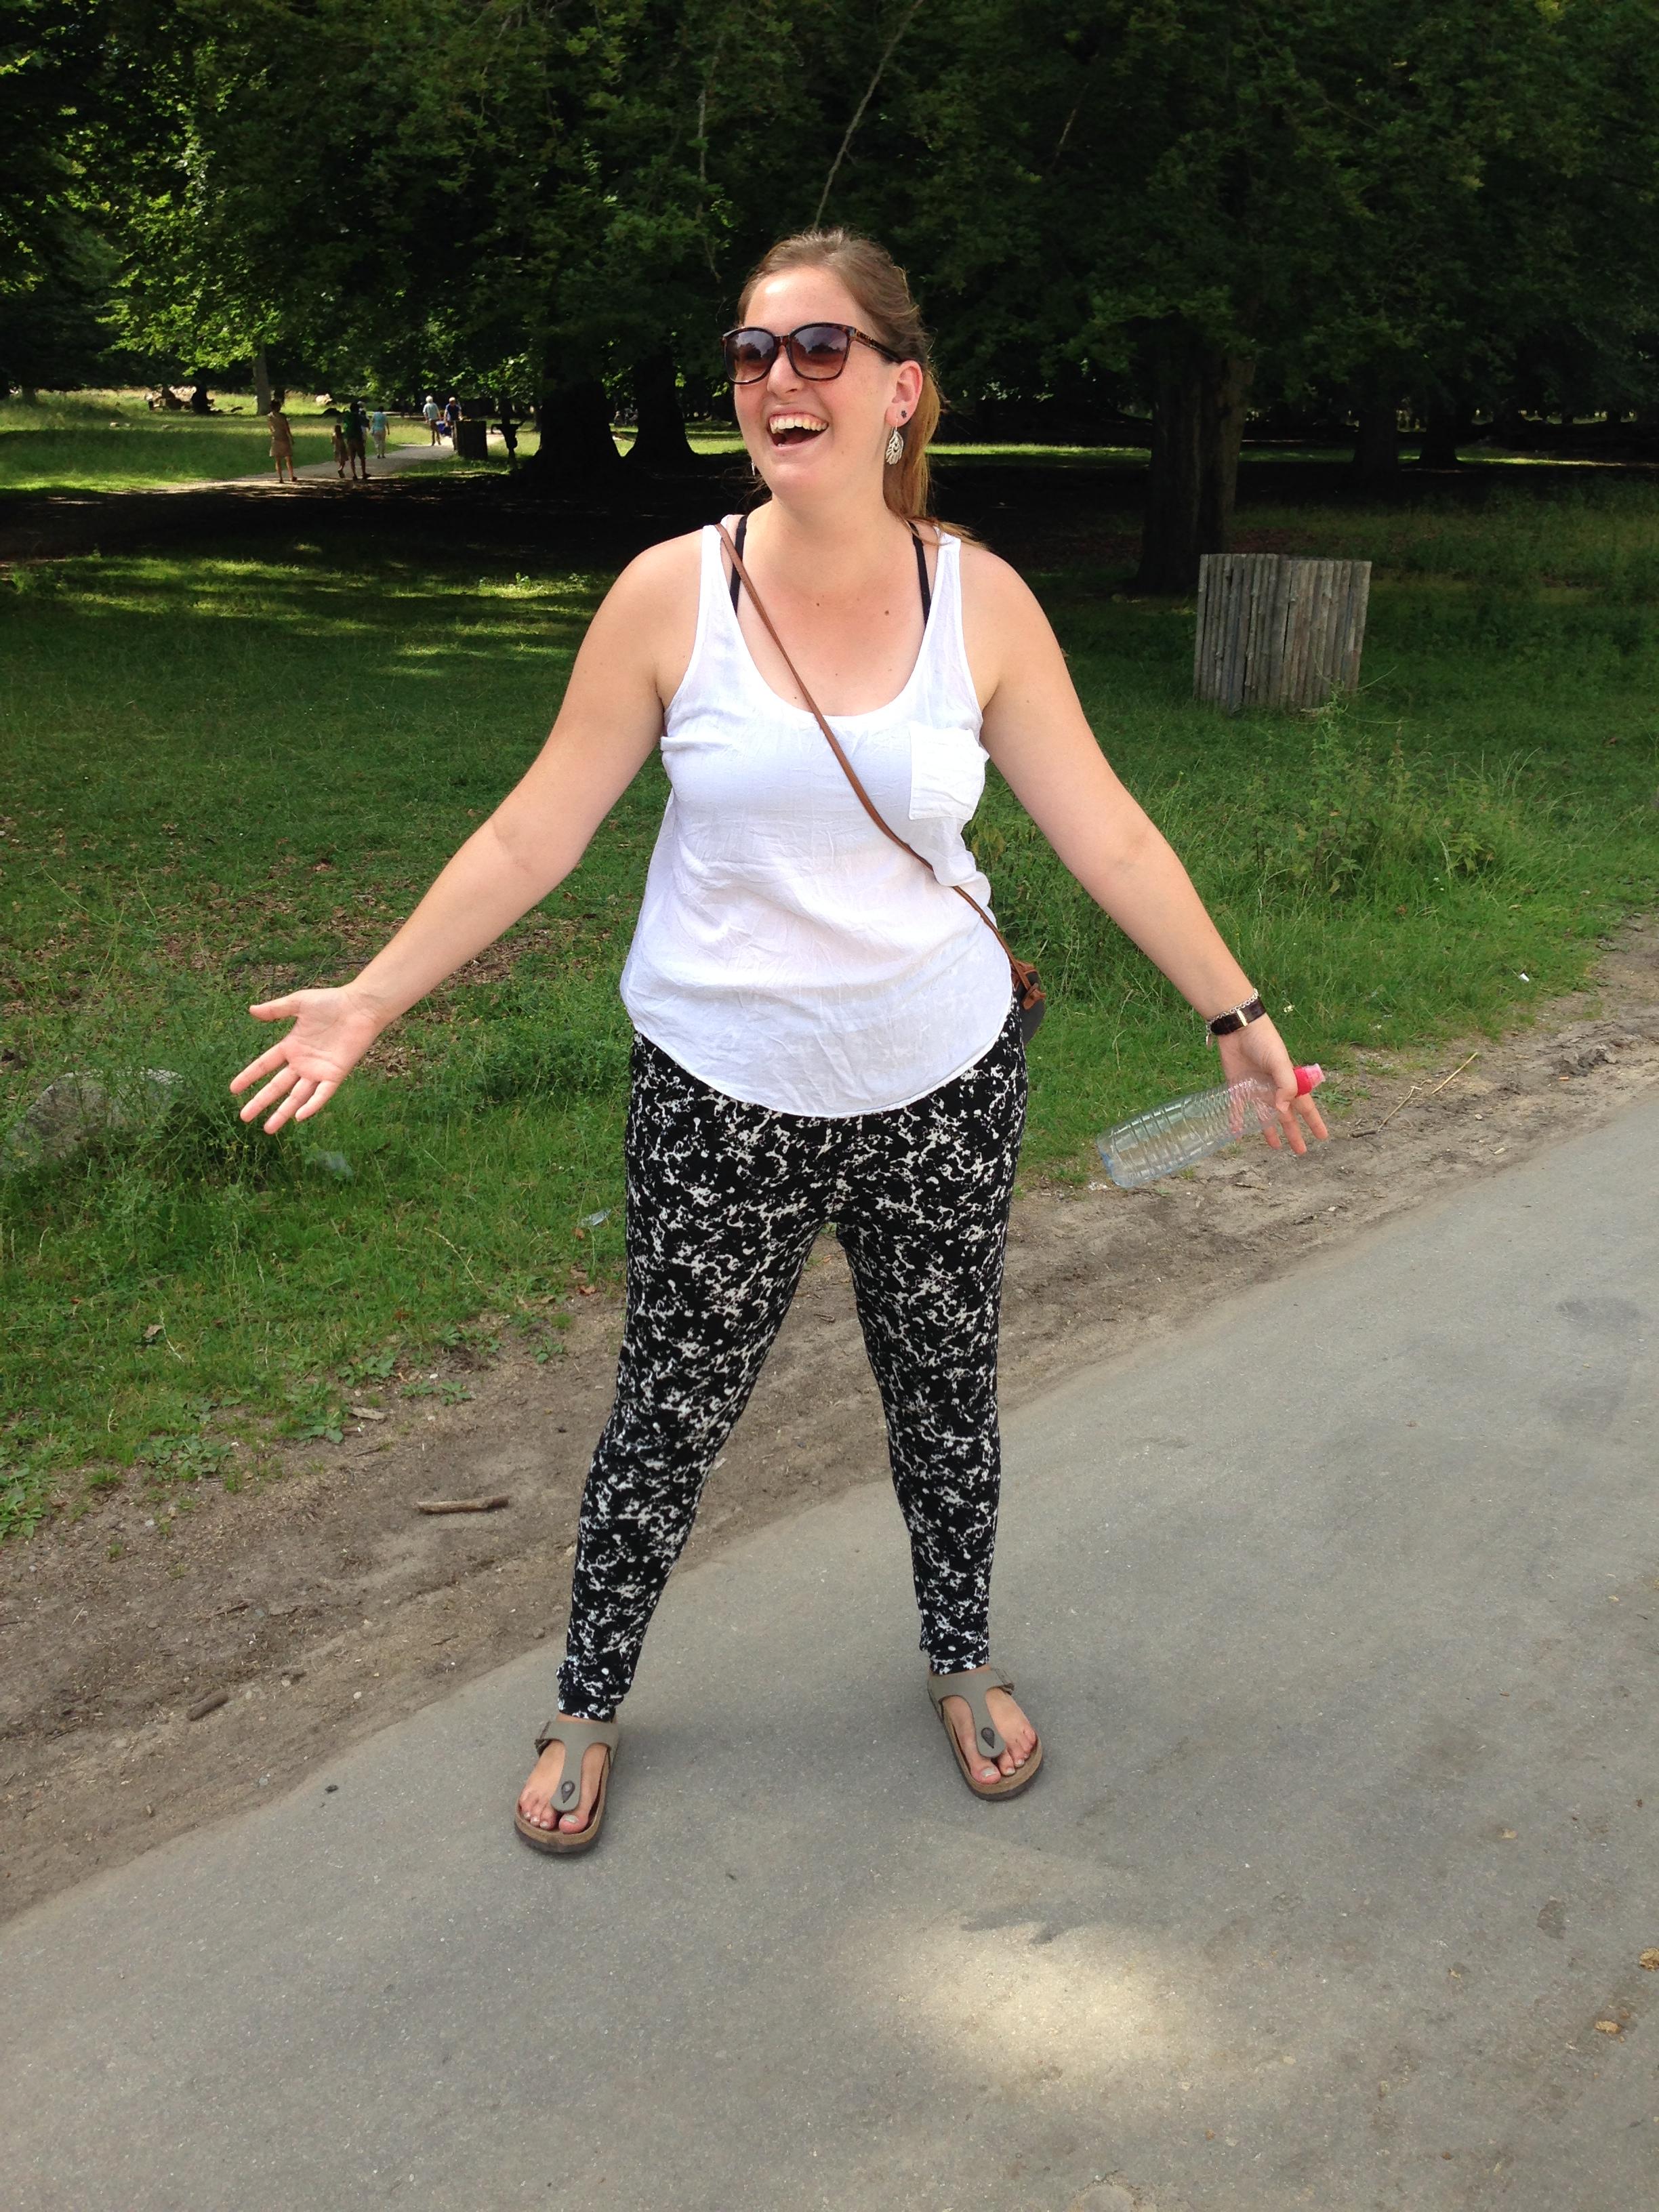 summer in Copenhagen parks